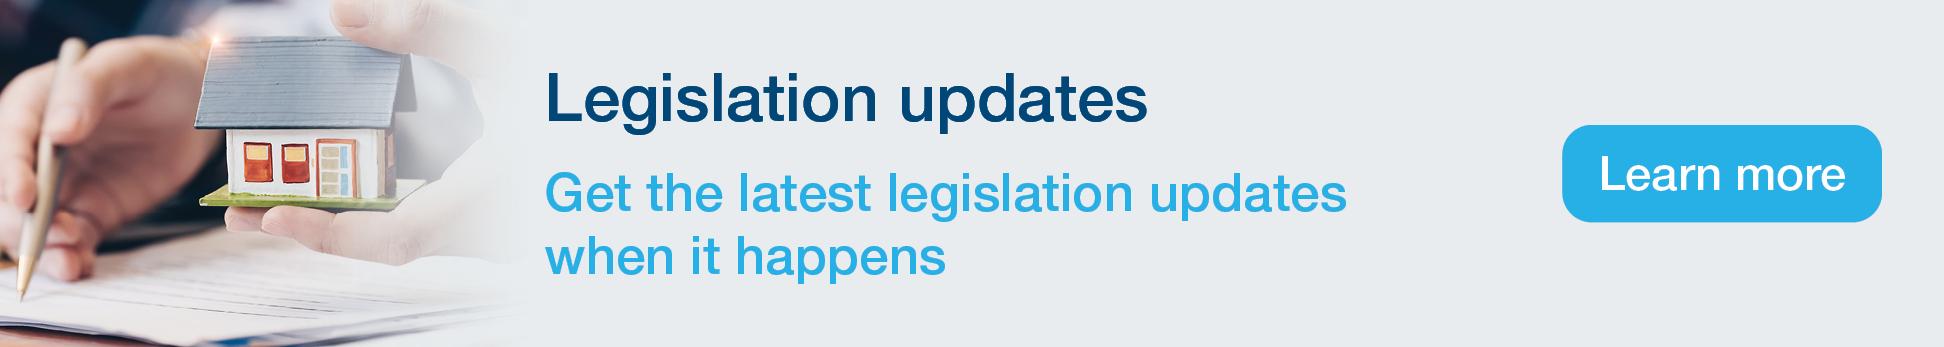 PICA Group legislation updates